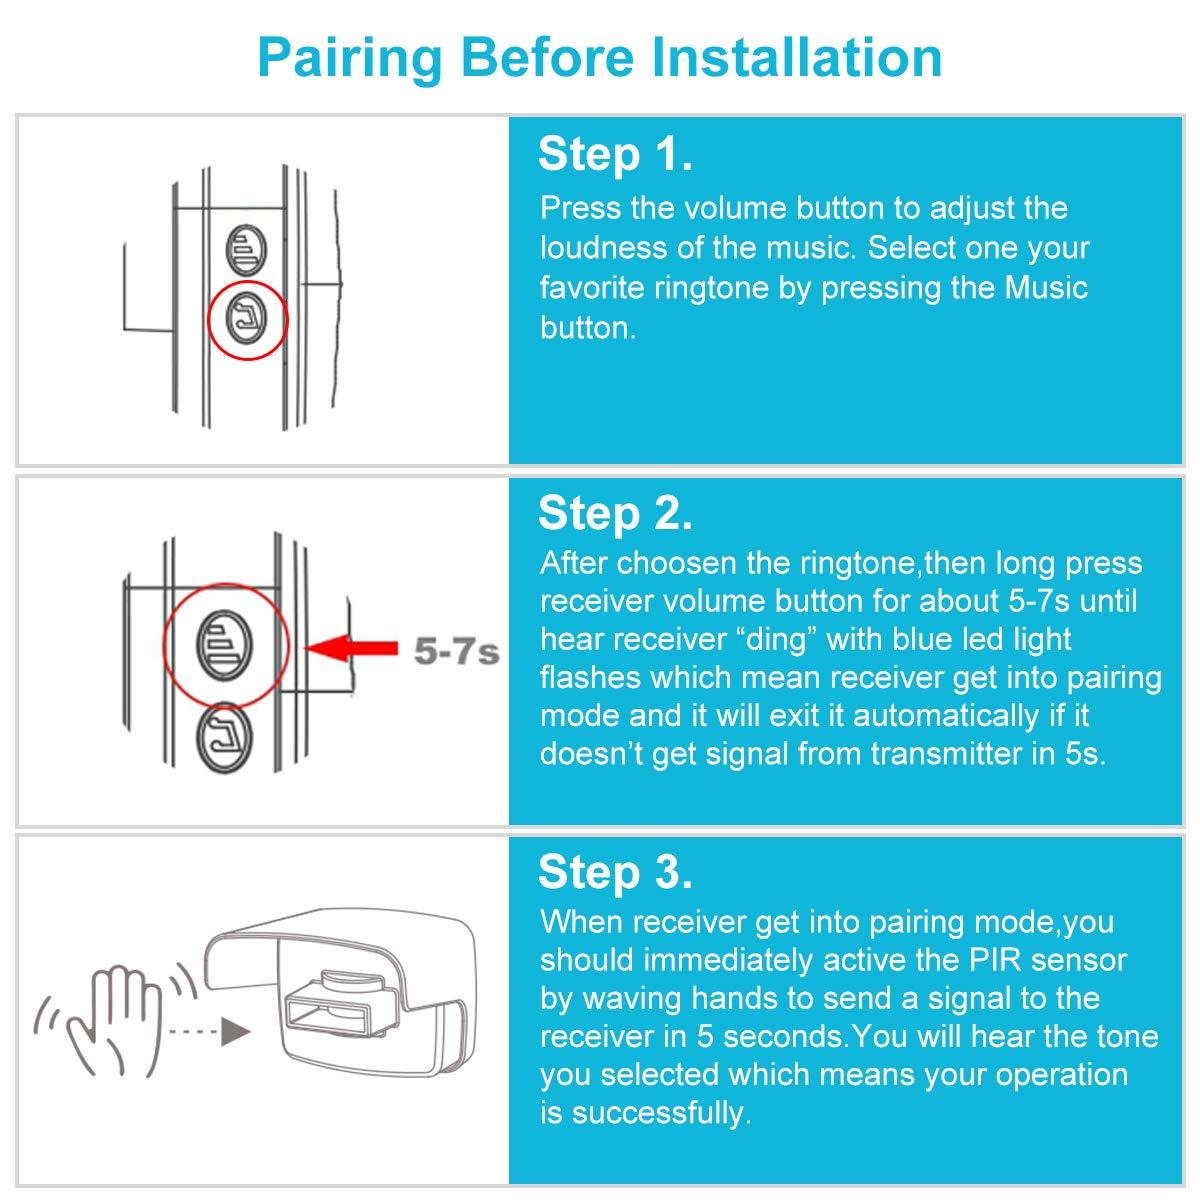 Driveway Sensor Wireless - Driveway Motion Detecor with 500ft Wireless Range,Driveway Motion Sensor Alarm Waterproof Motion Sensor & Detector for Home,Yard,Garage (1 Driveway Sensor + 1 Receiver)